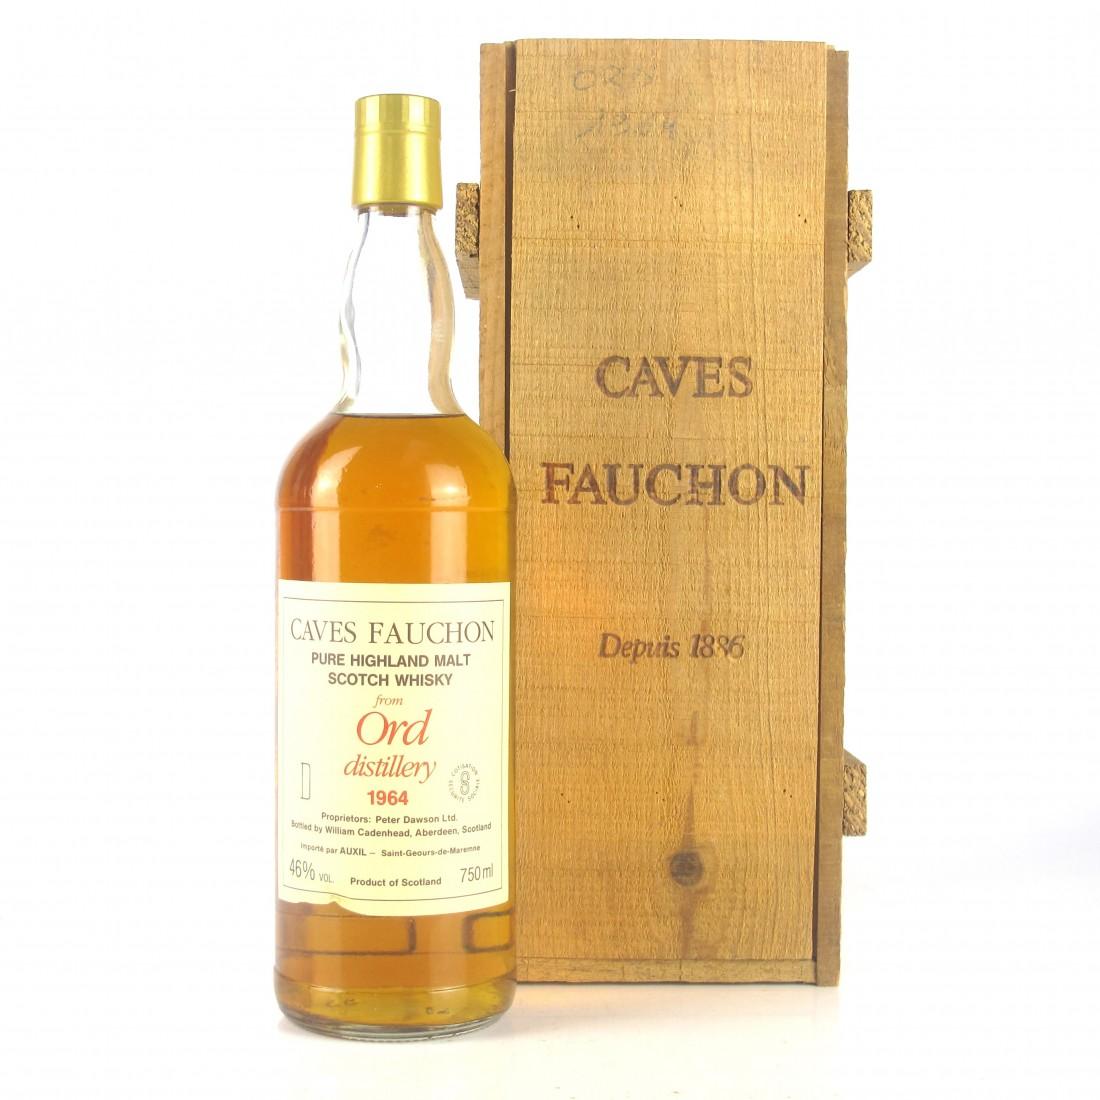 Glen Ord 1964 Caves Fauchon